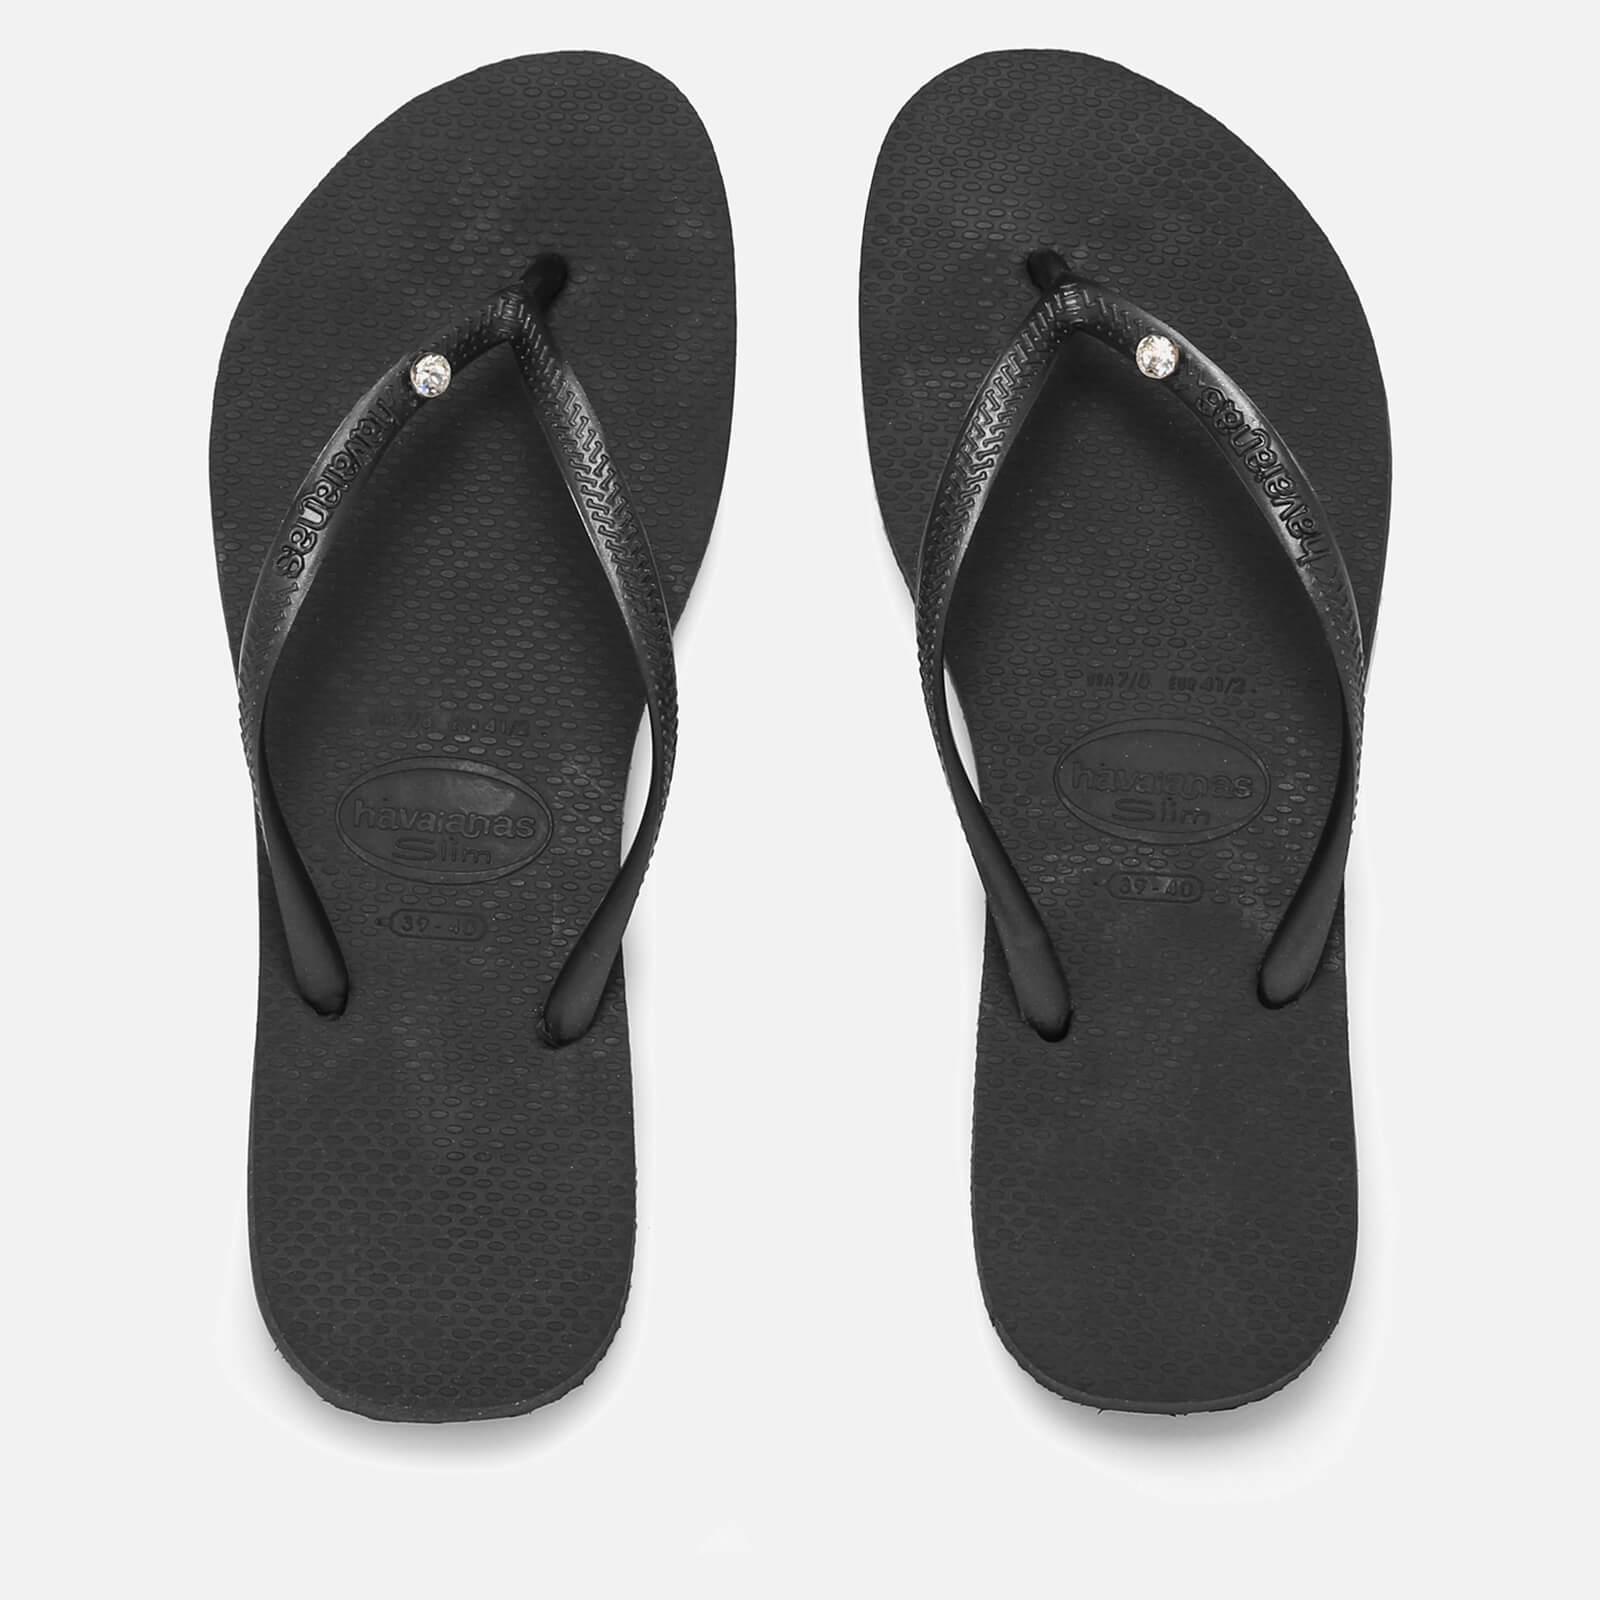 ad4eb855433e Havaianas Slim Swarovski Crystal Glamour Flip Flops in Black - Lyst